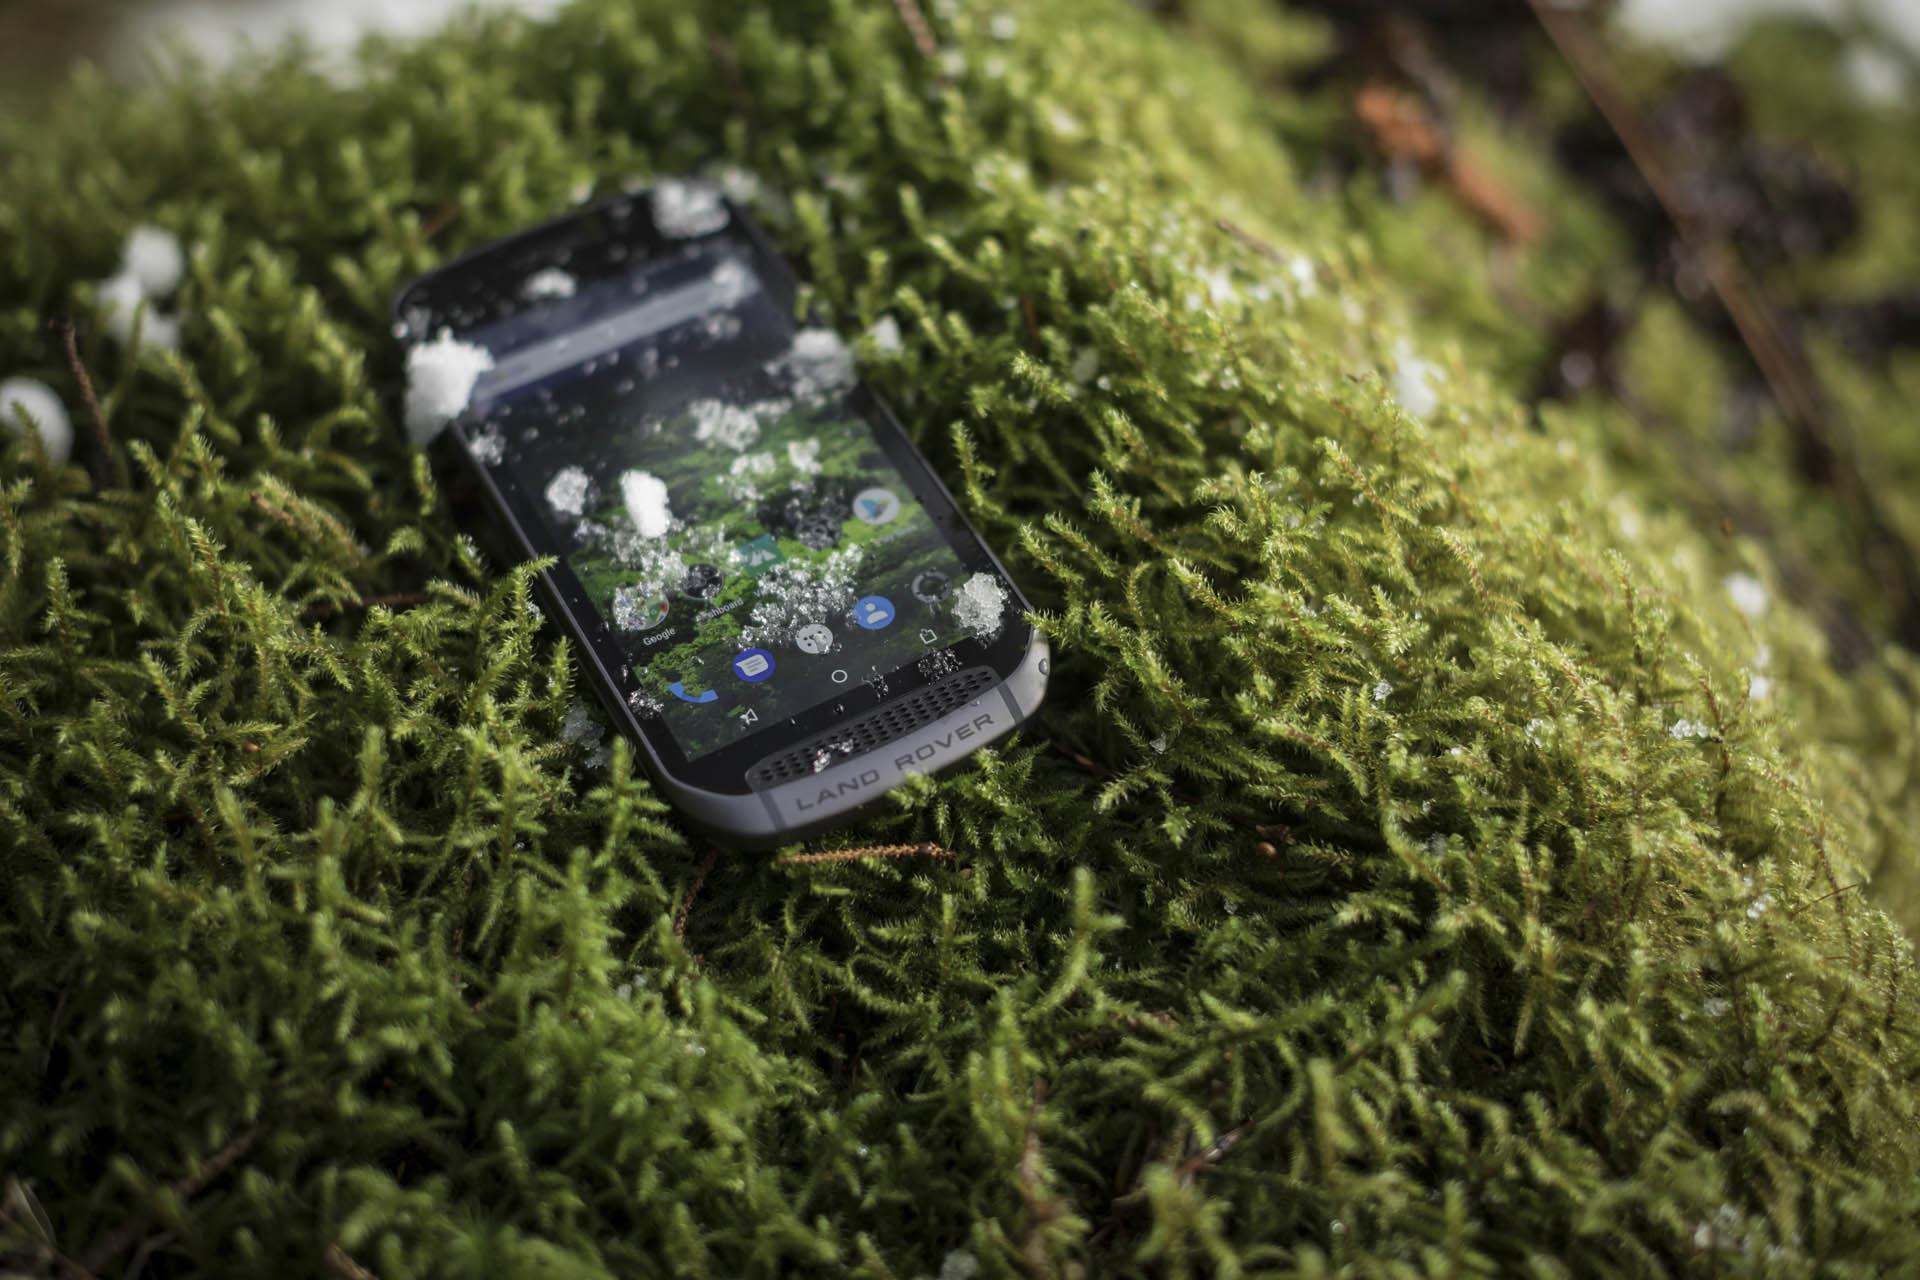 Land Rover Explorer Smartphone (2)